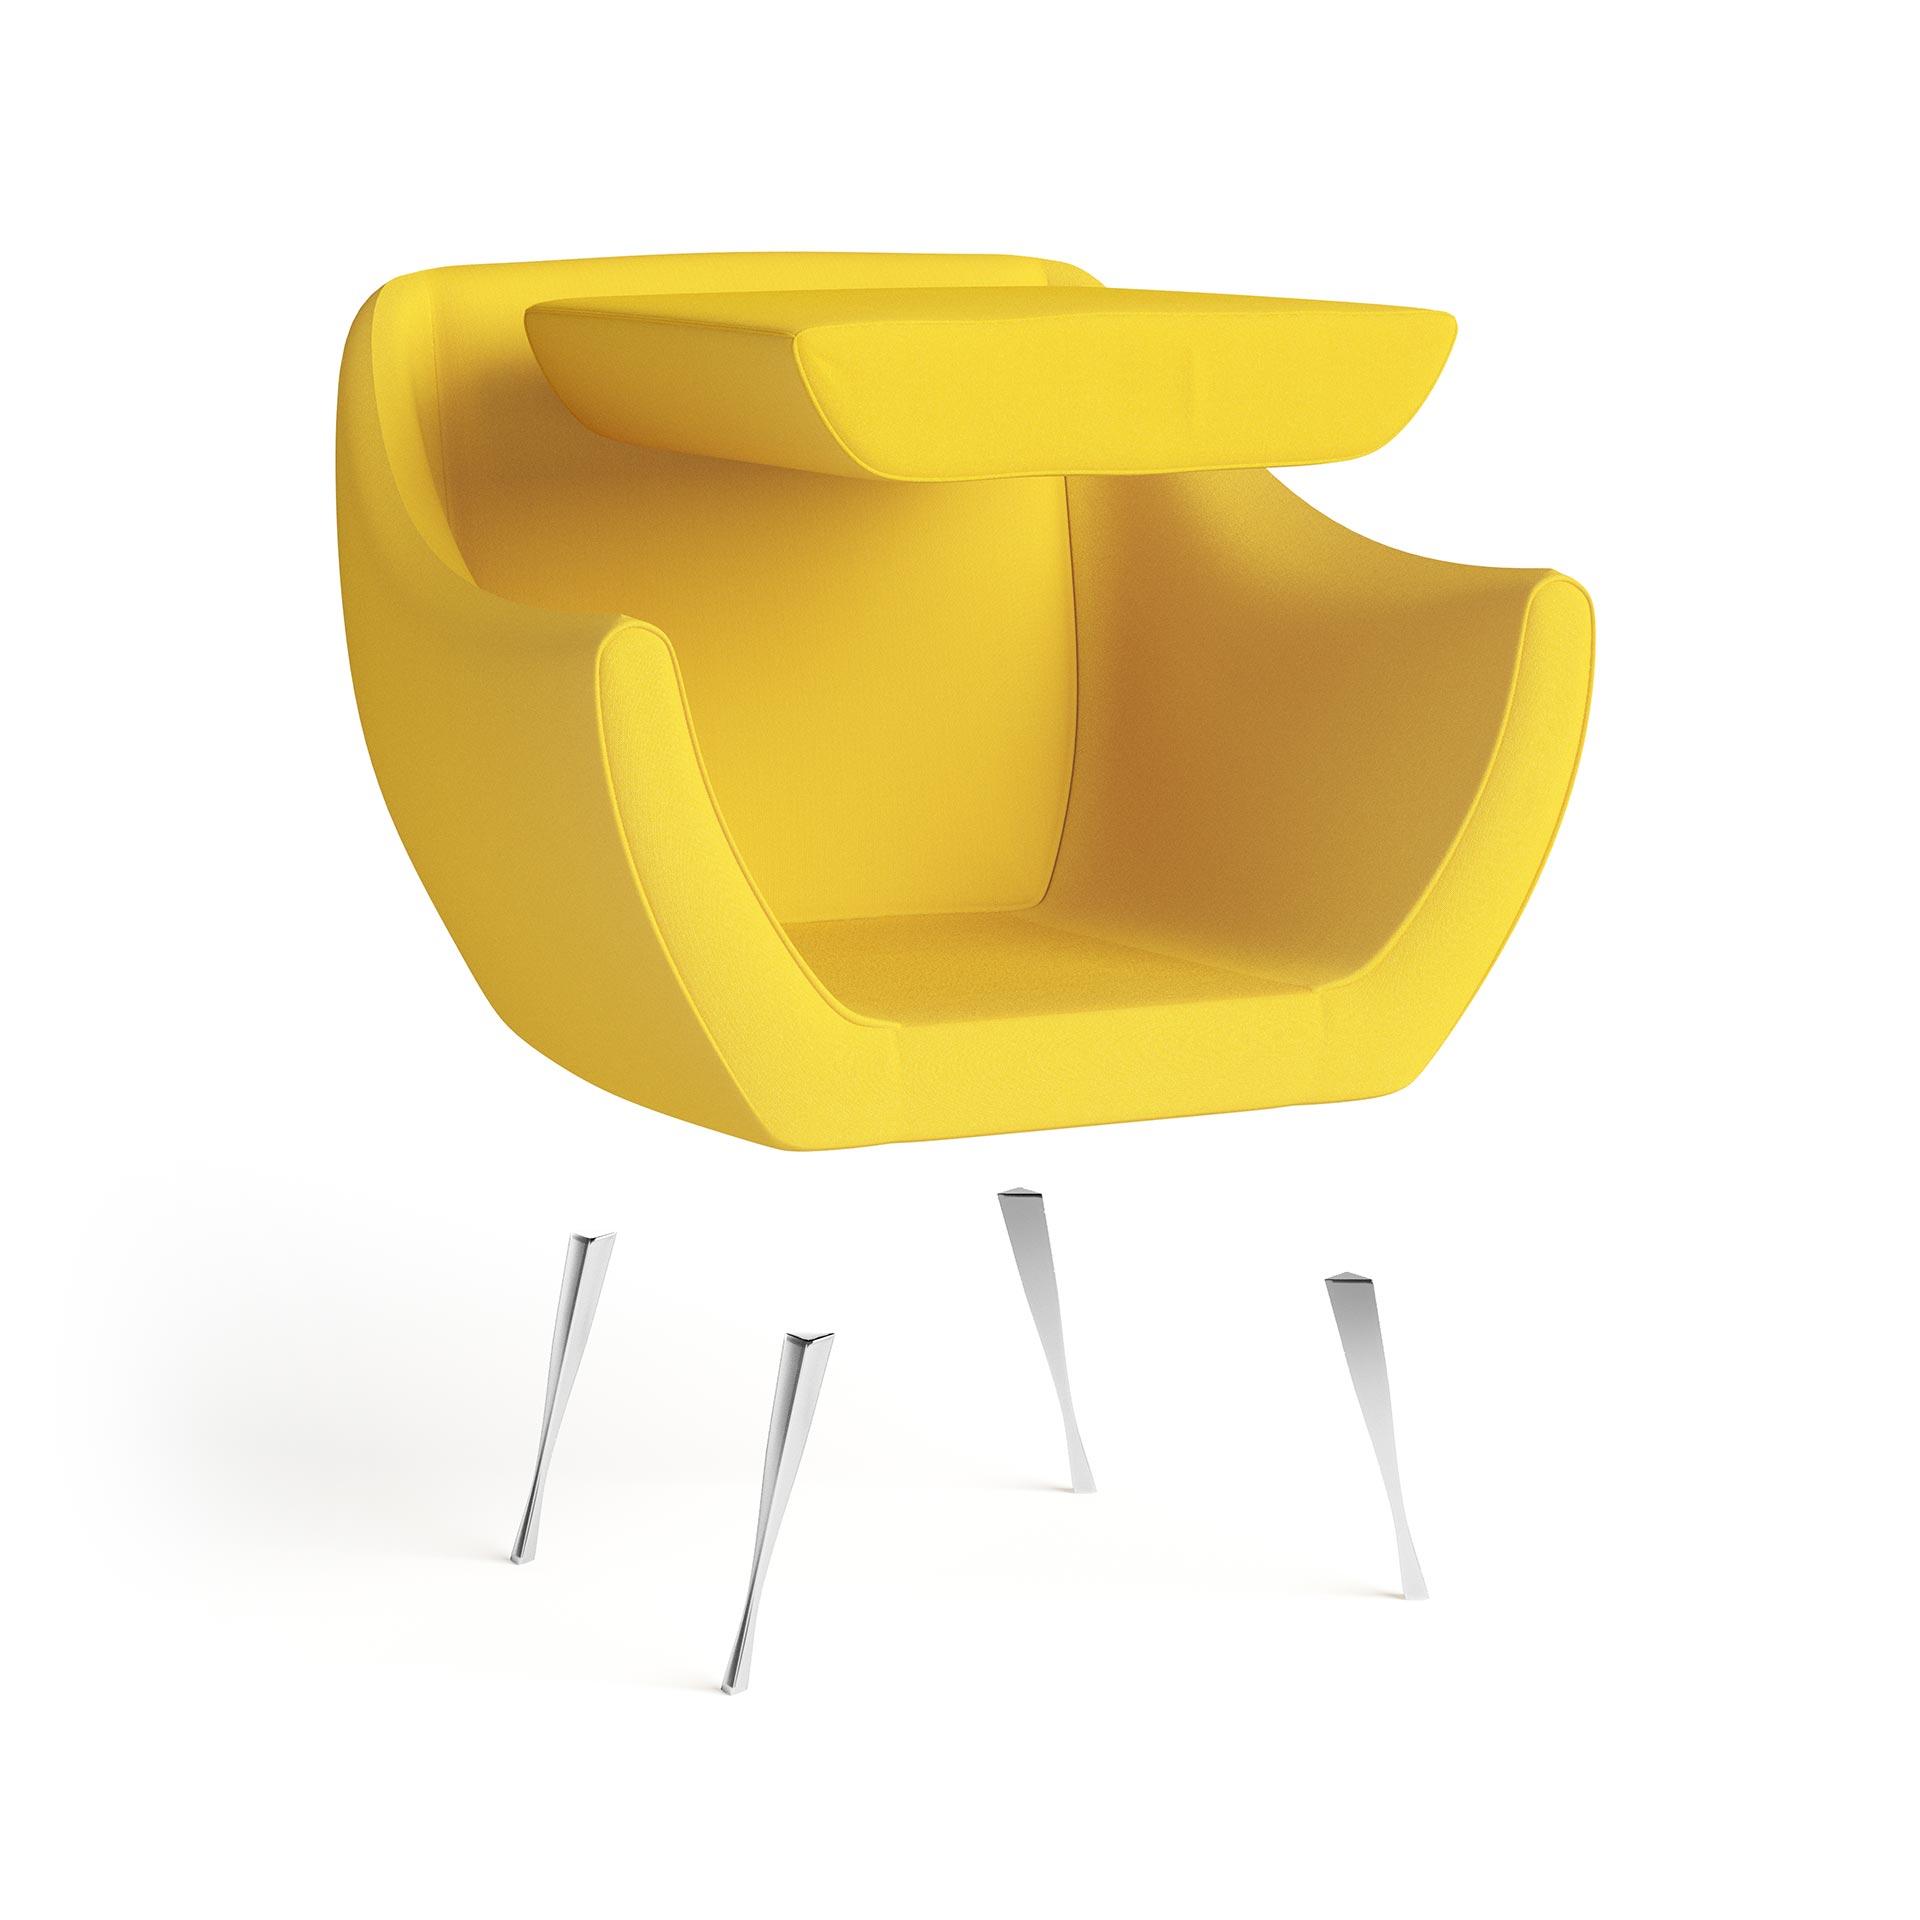 Rita Furniture Exploded Rendering Yellow